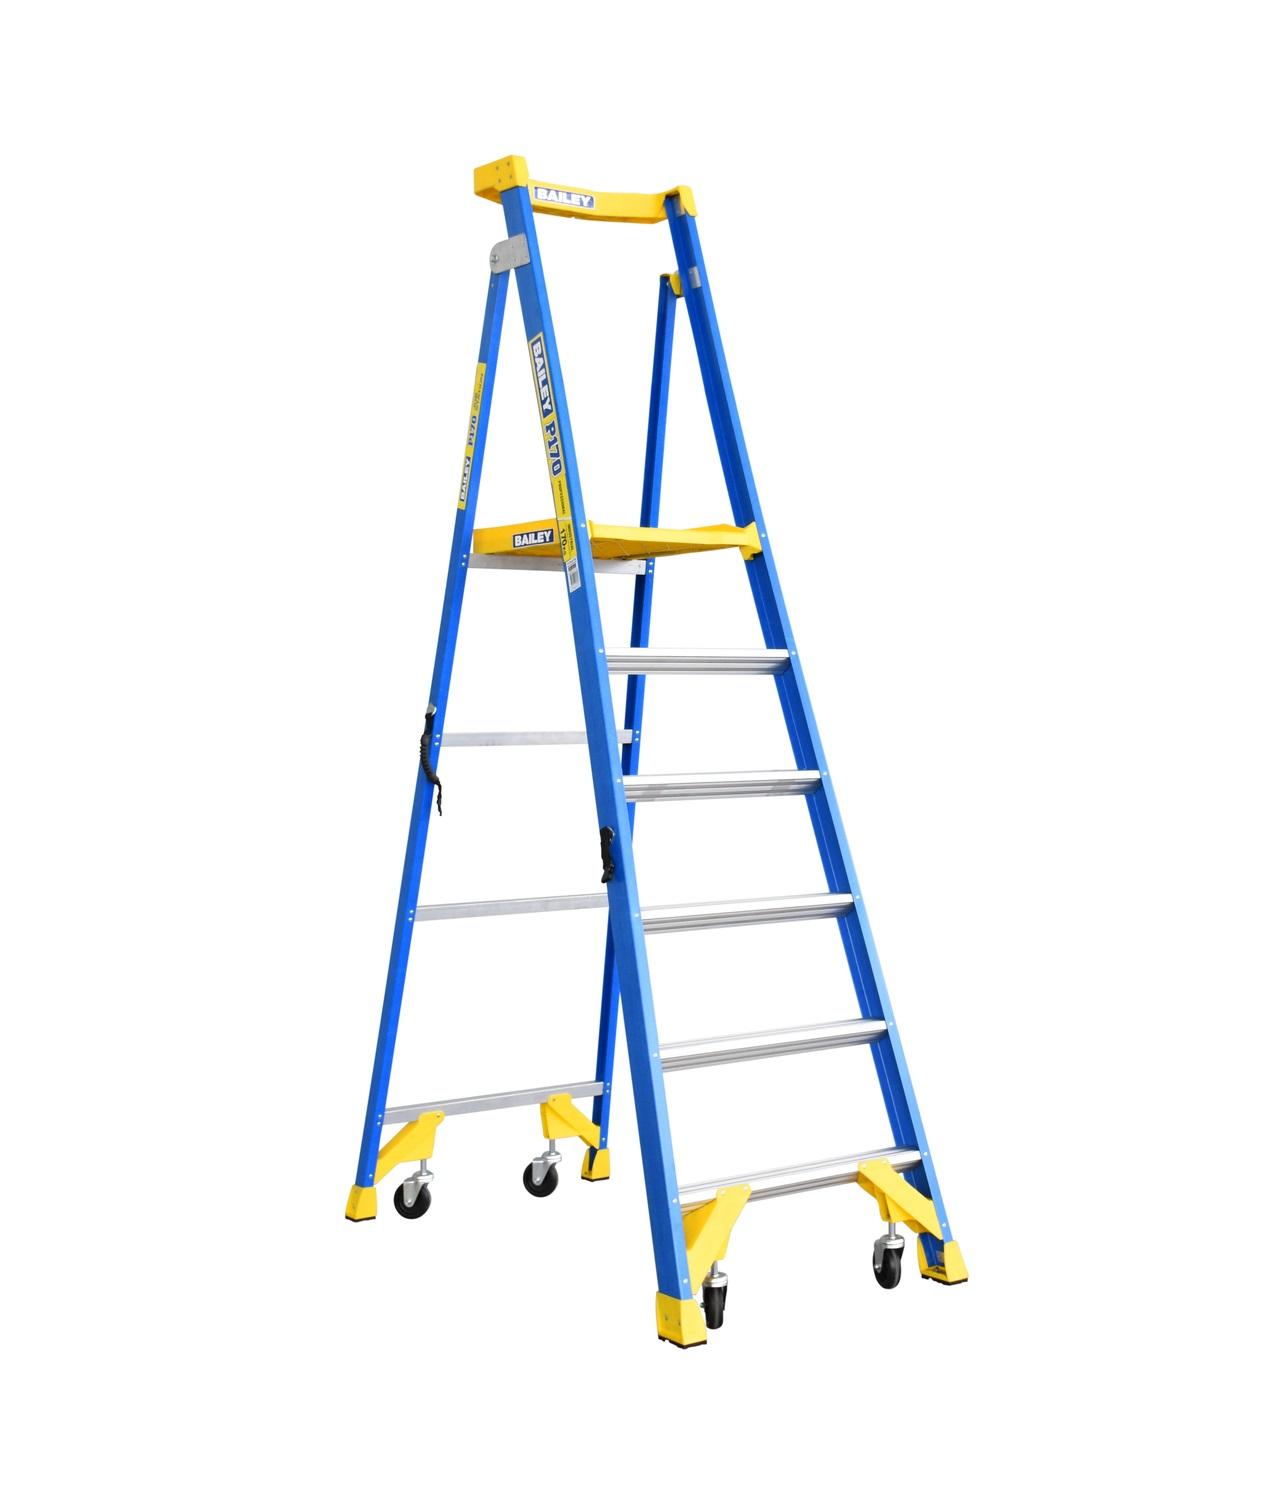 Werner_P170-6 FG_Fiberglass Step Ladder